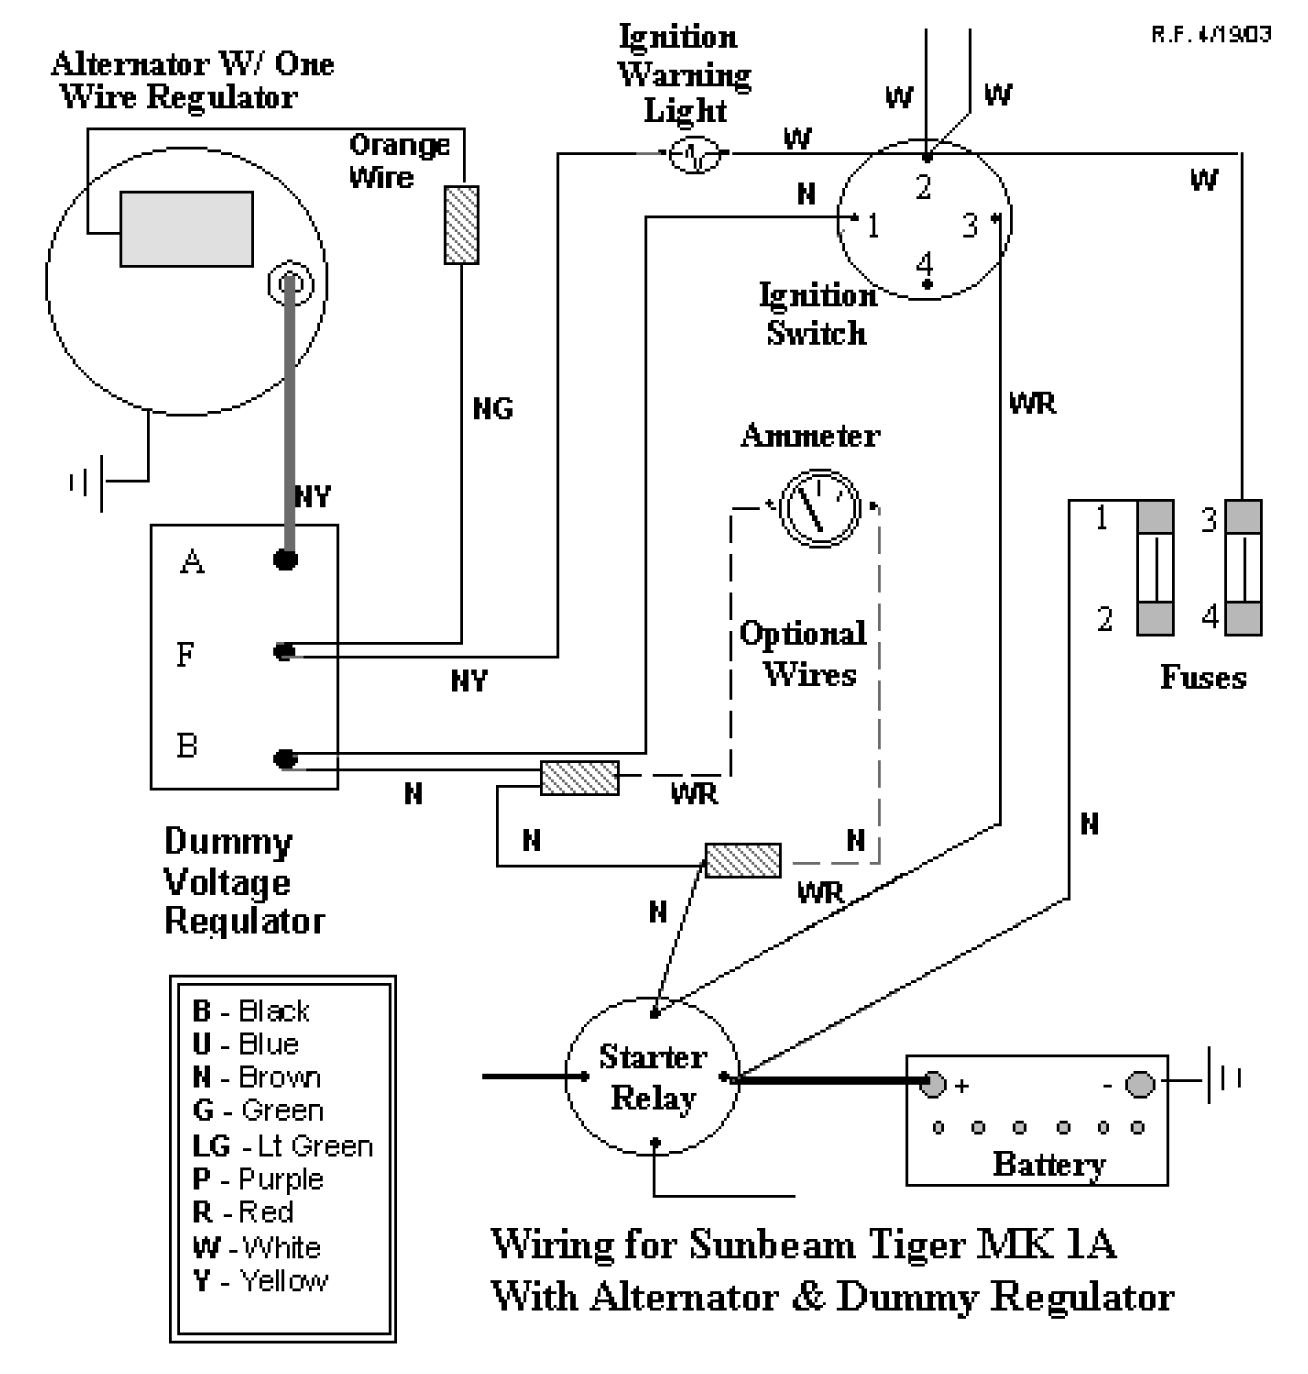 tags: #ford external regulator wiring diagram for asel#1968 ford external  regulator wiring diagram#ford external voltage regulator wiring#3 wire ford